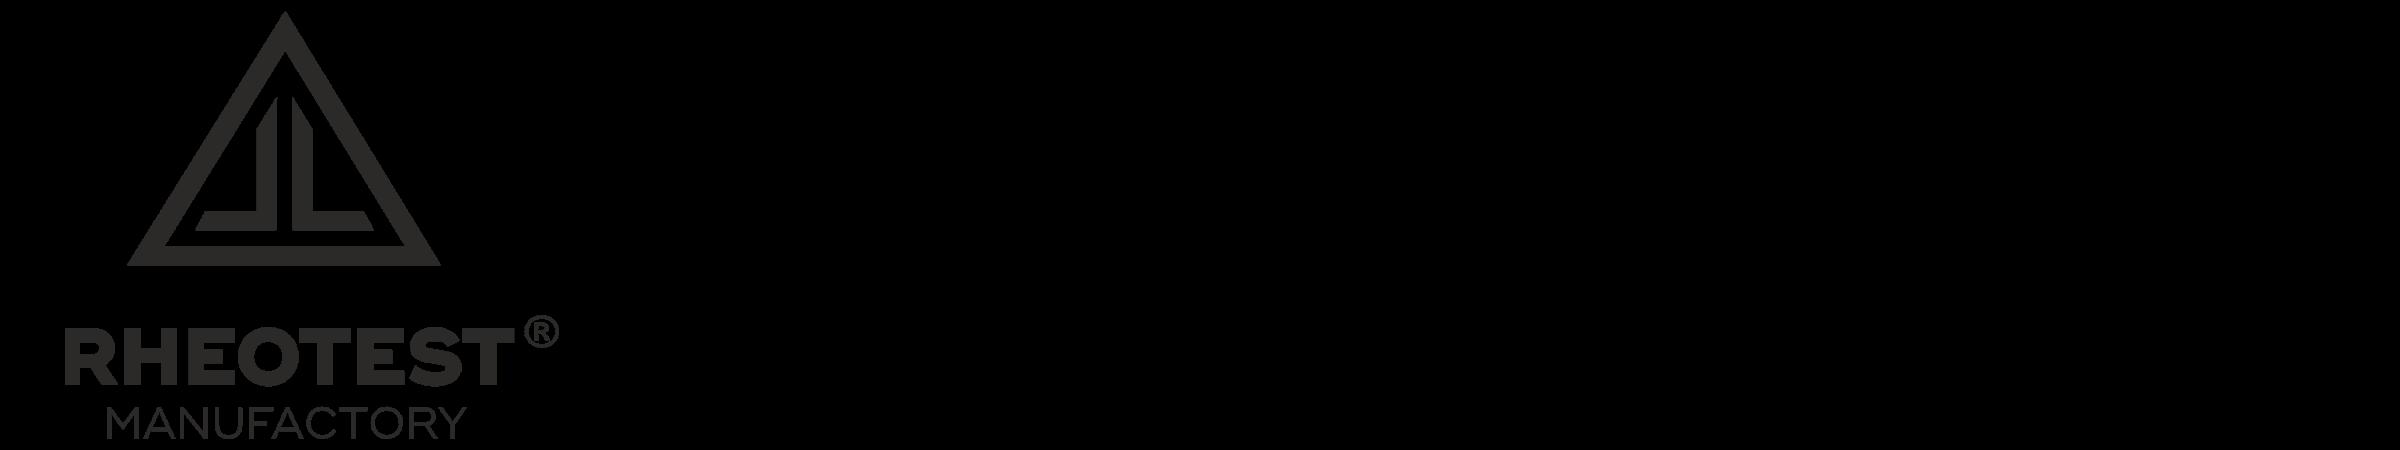 Rheotest流变仪